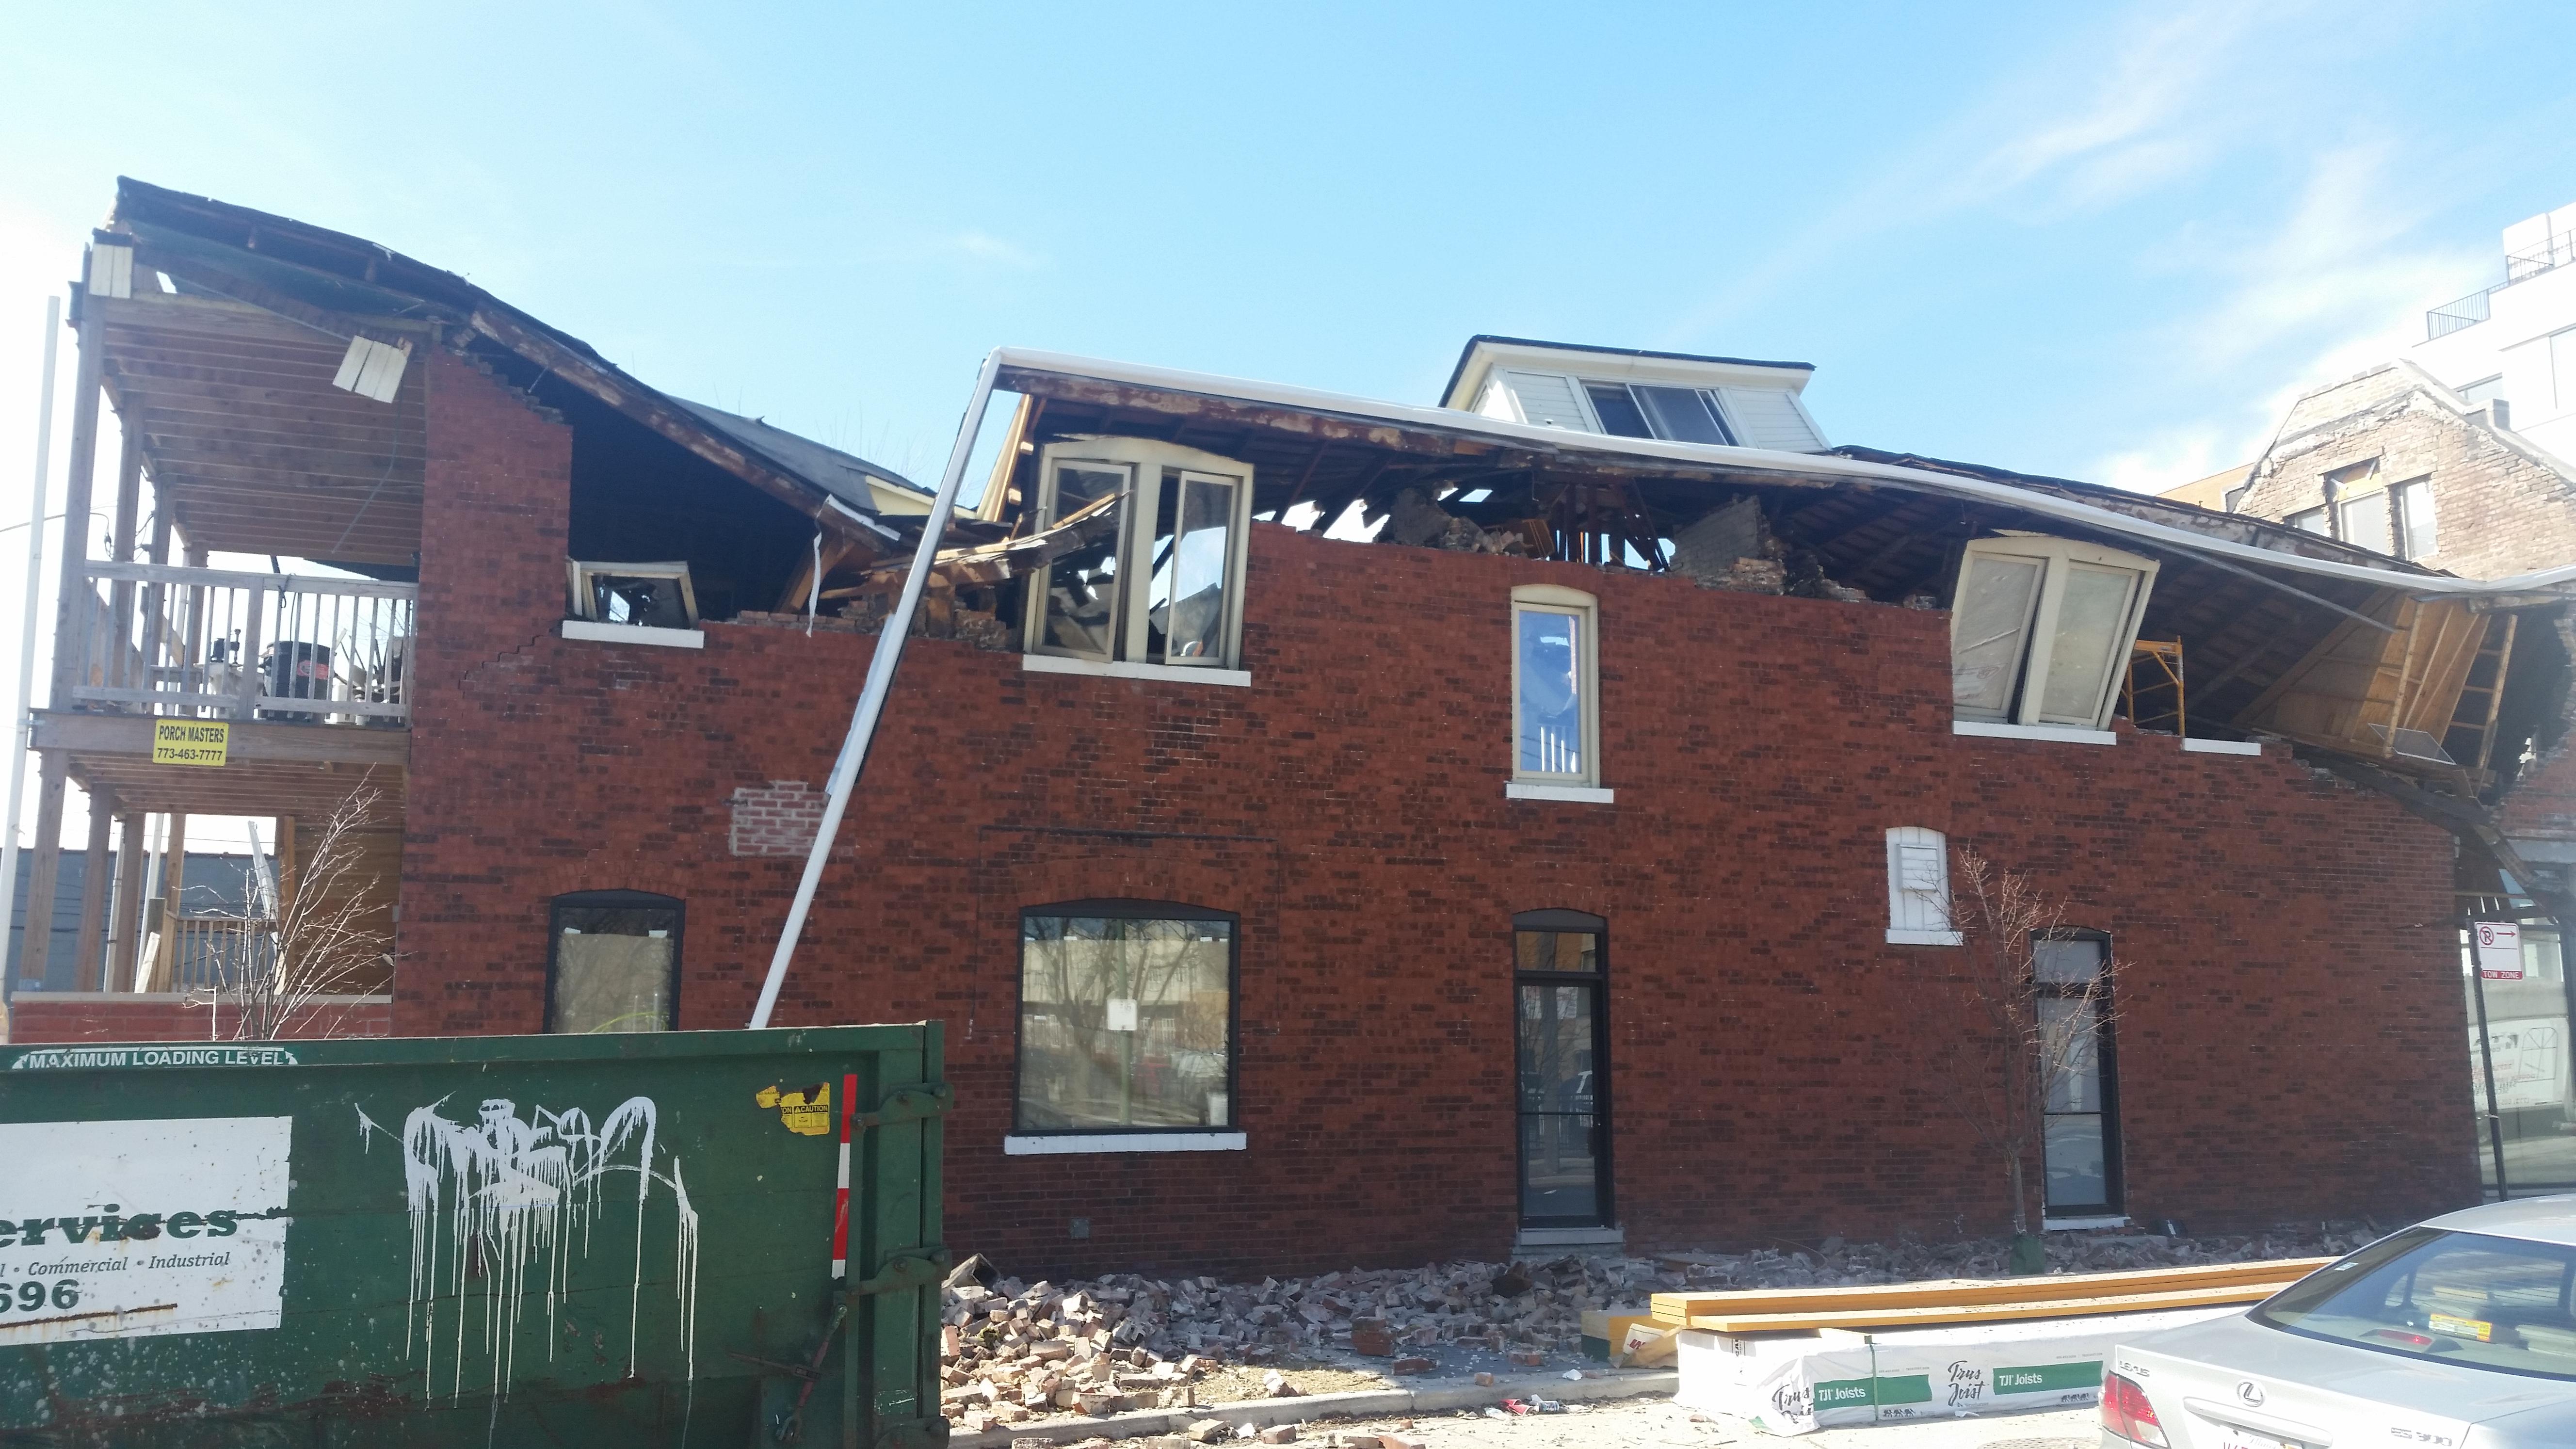 Jefferson Park collapsed building